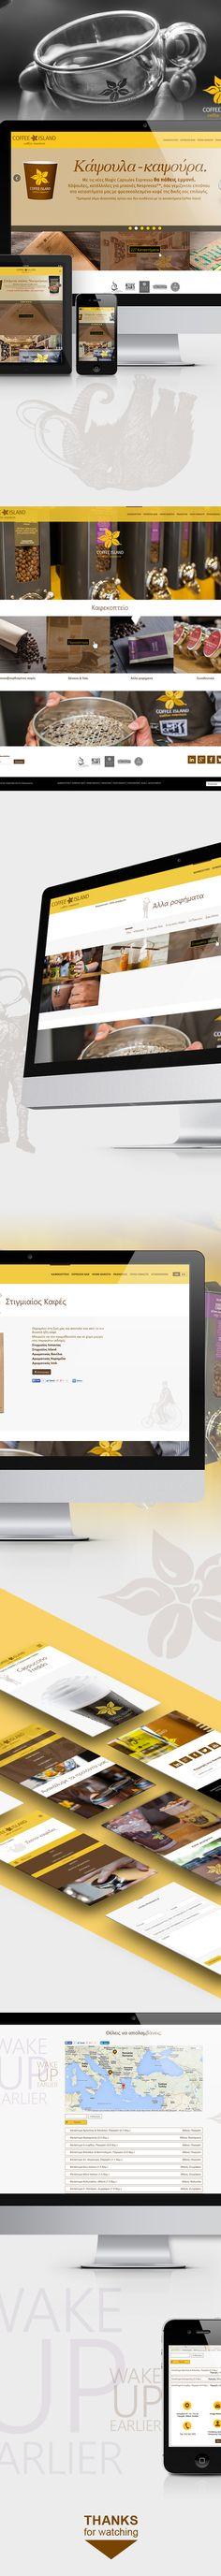 "Redesign Website ""coffeeisland.gr"" on Behance"